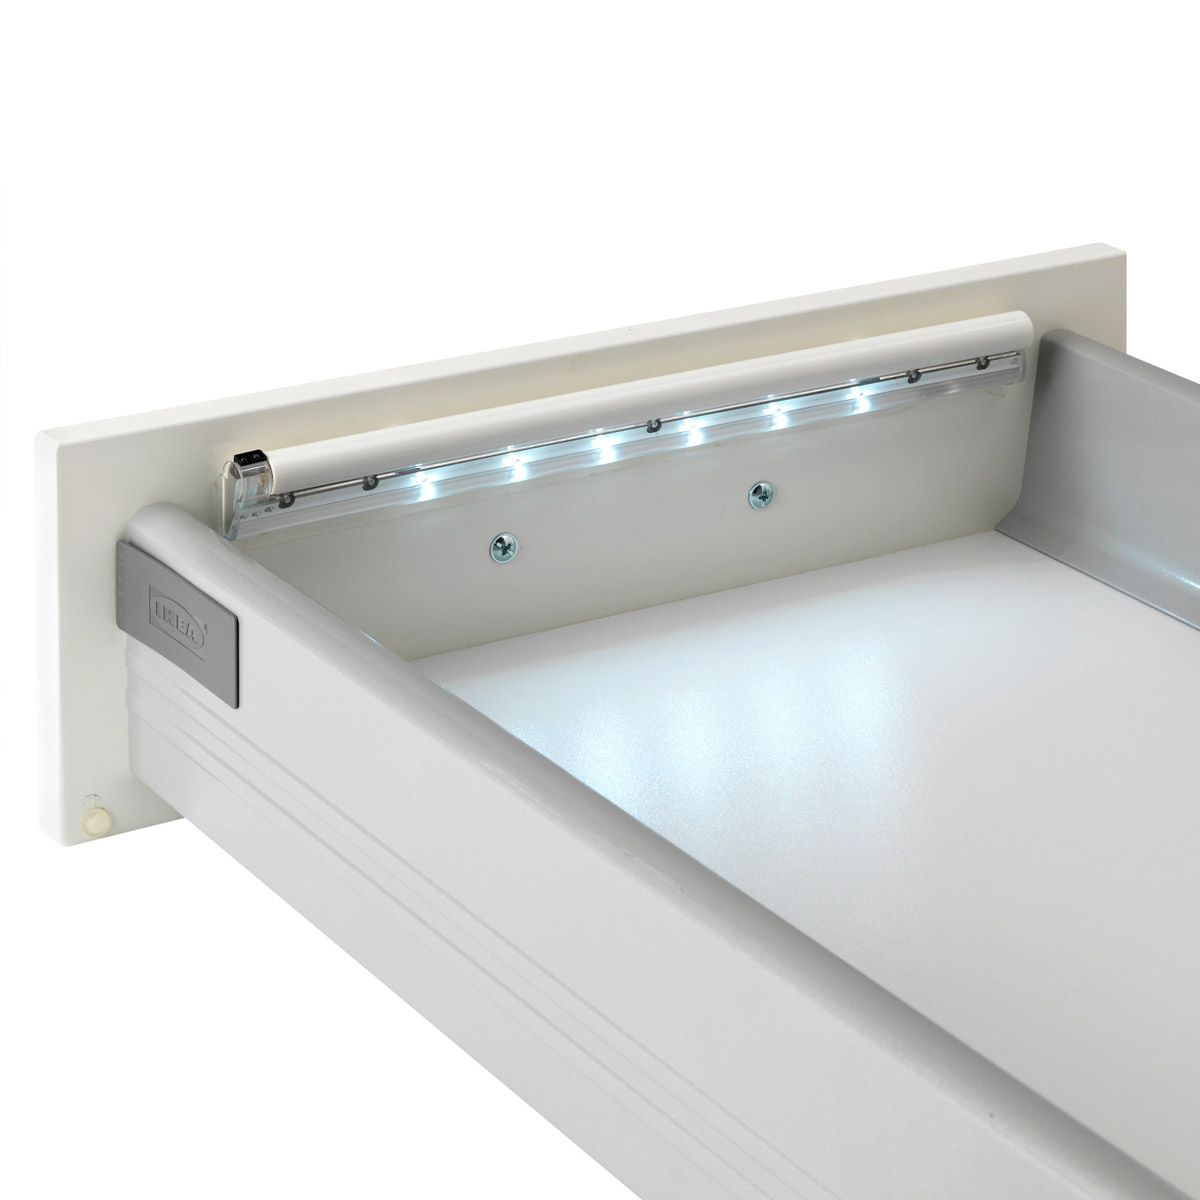 New IKEA LED Lamp For Illuminating Storage Drawers   DI ... - photo#6